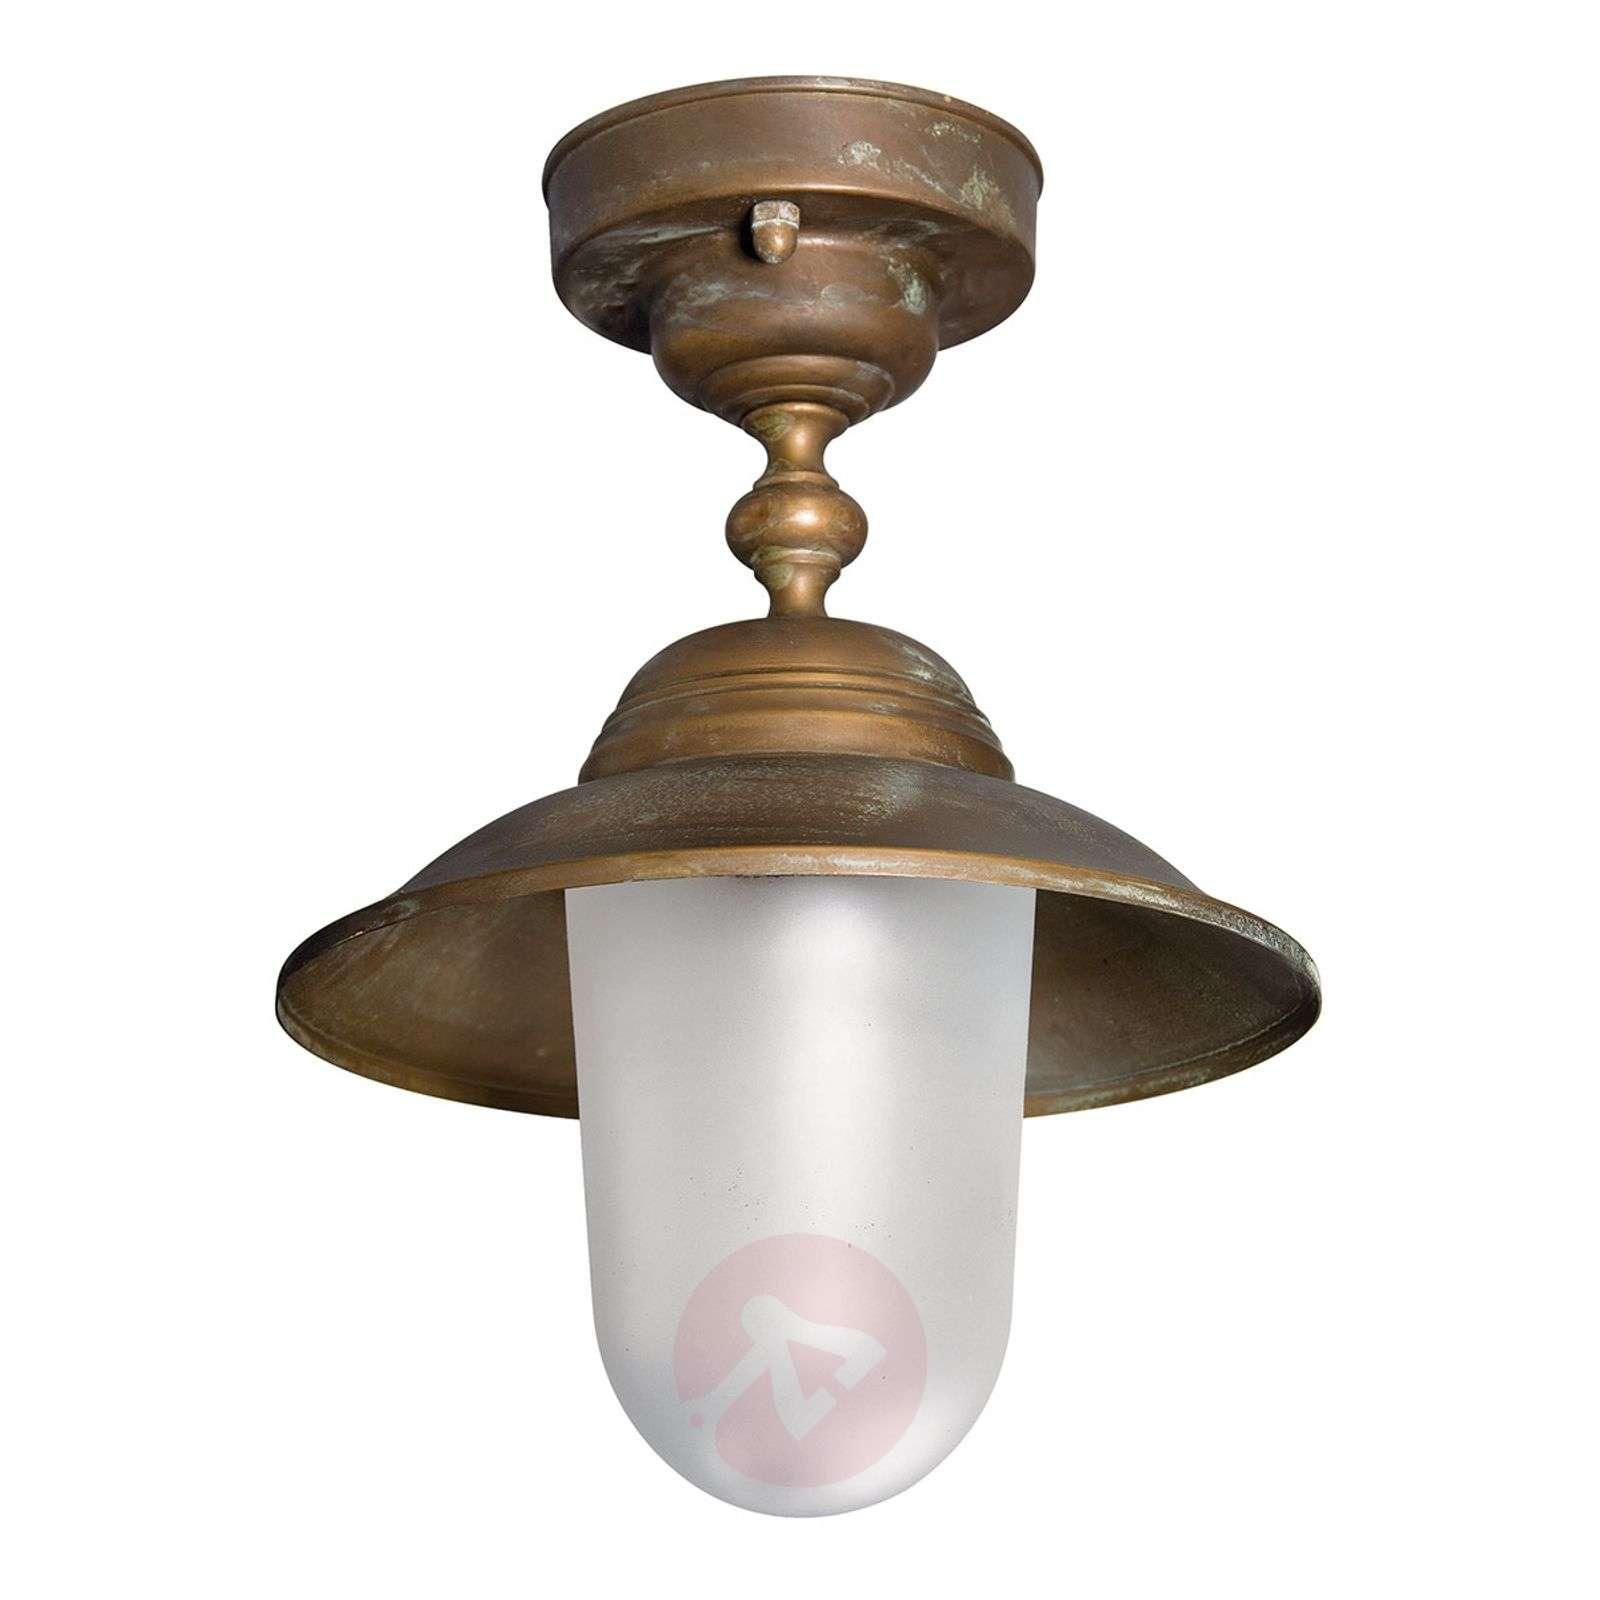 Ceiling light Salina – seawater-resistant version-6515226-01